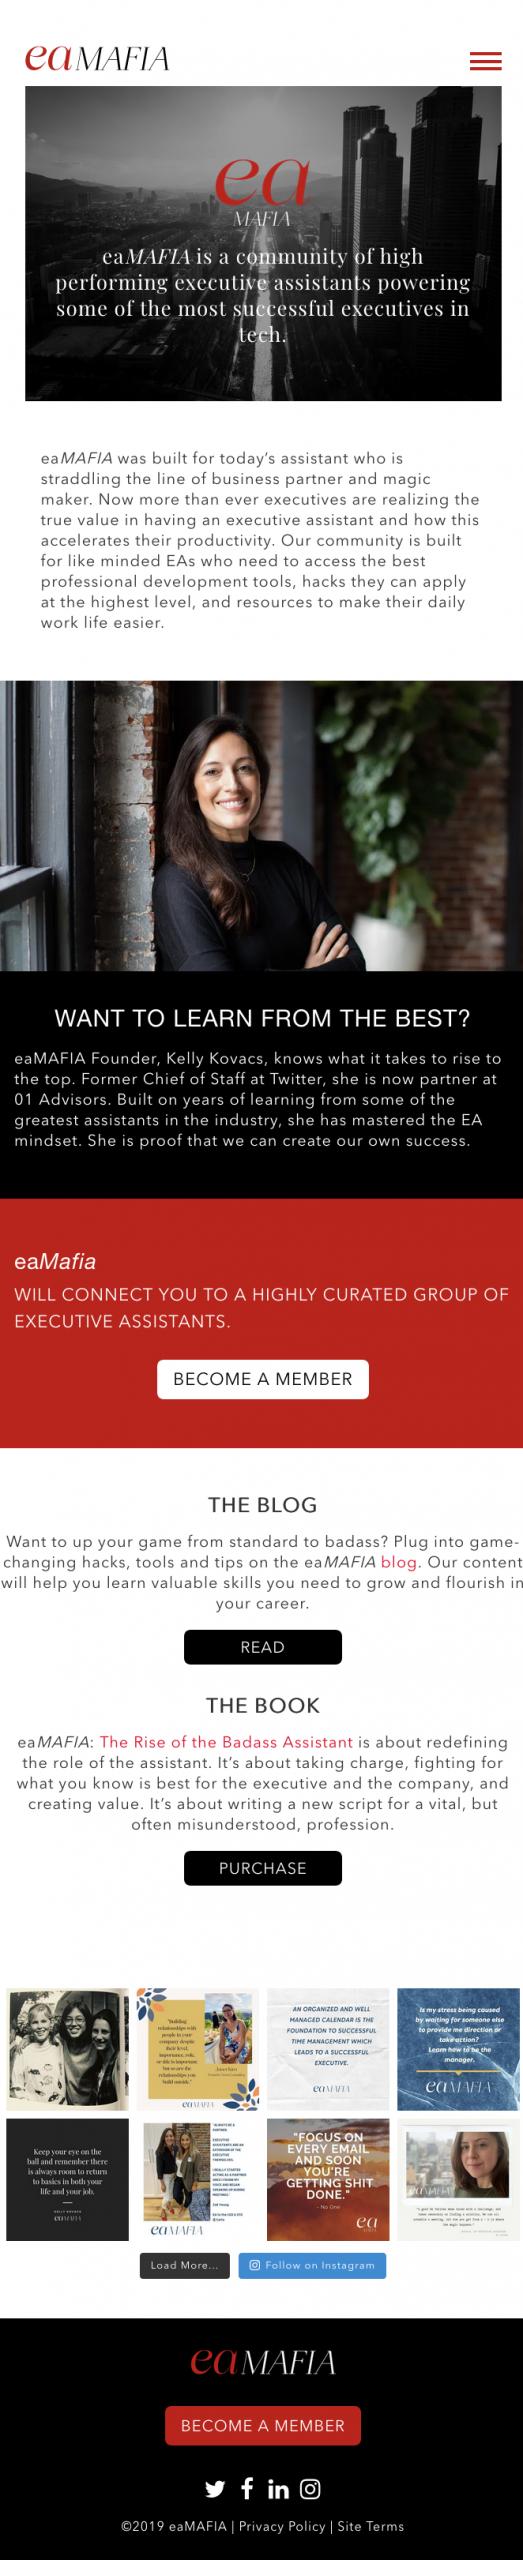 eaMAFIA mobile home